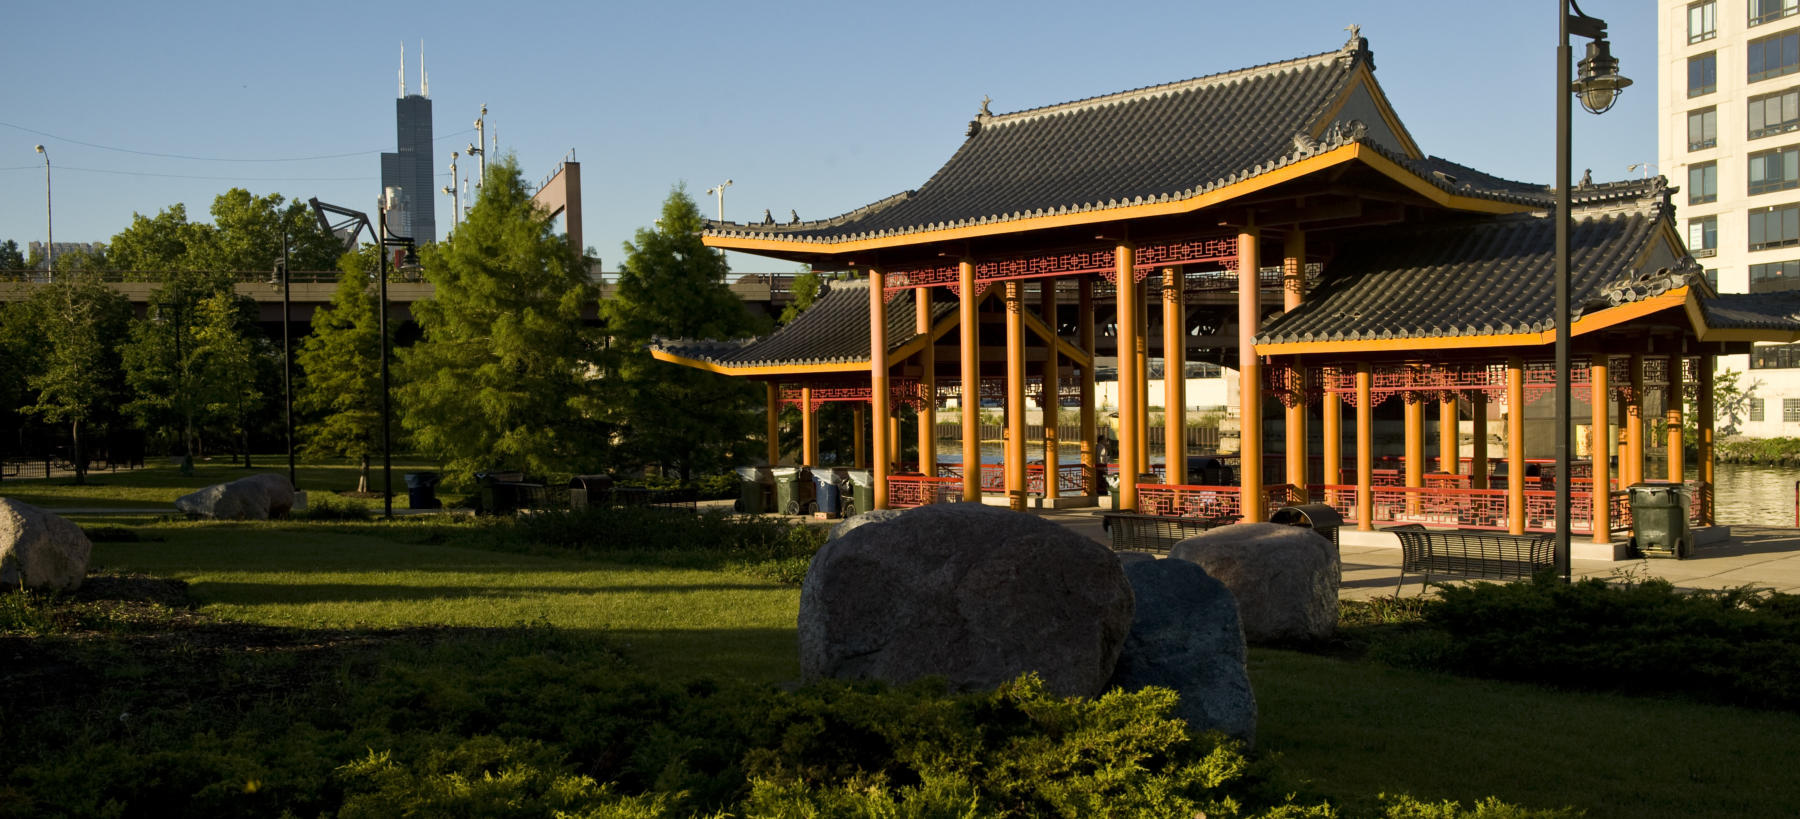 Explore Asian culture in Chicago's neighborhoods